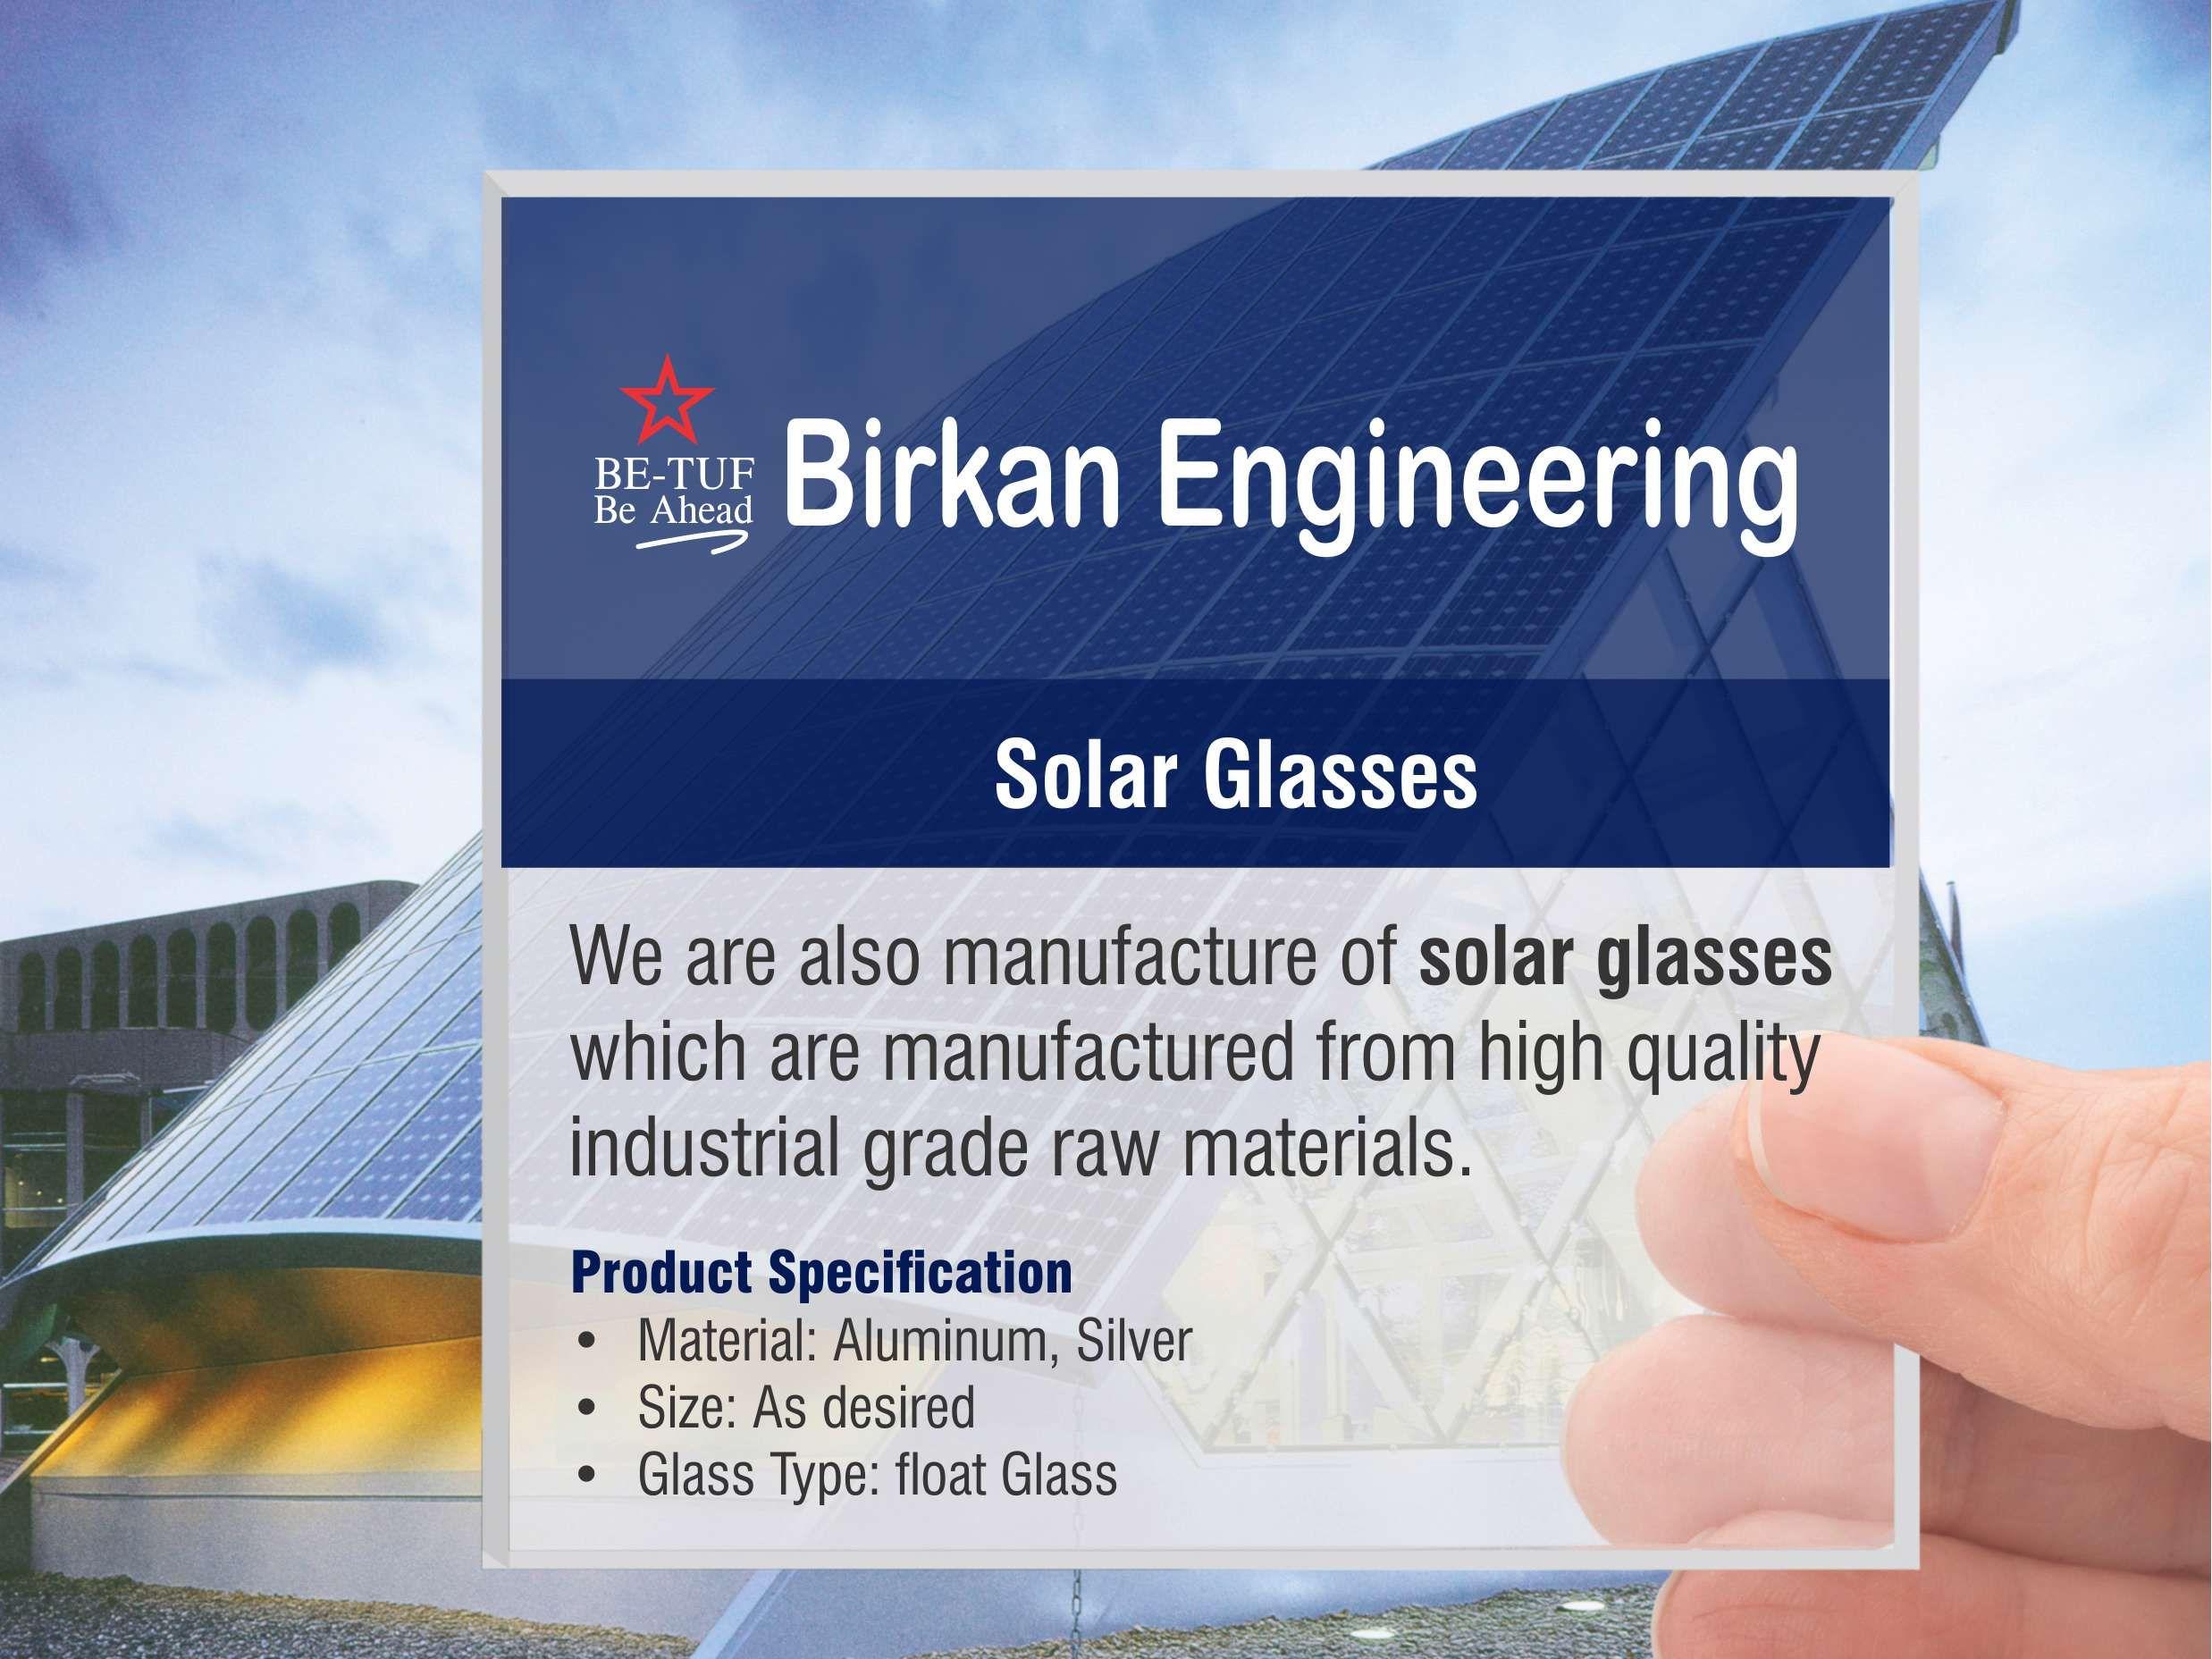 Birkan Engineering Industries Is The Leader In Design And